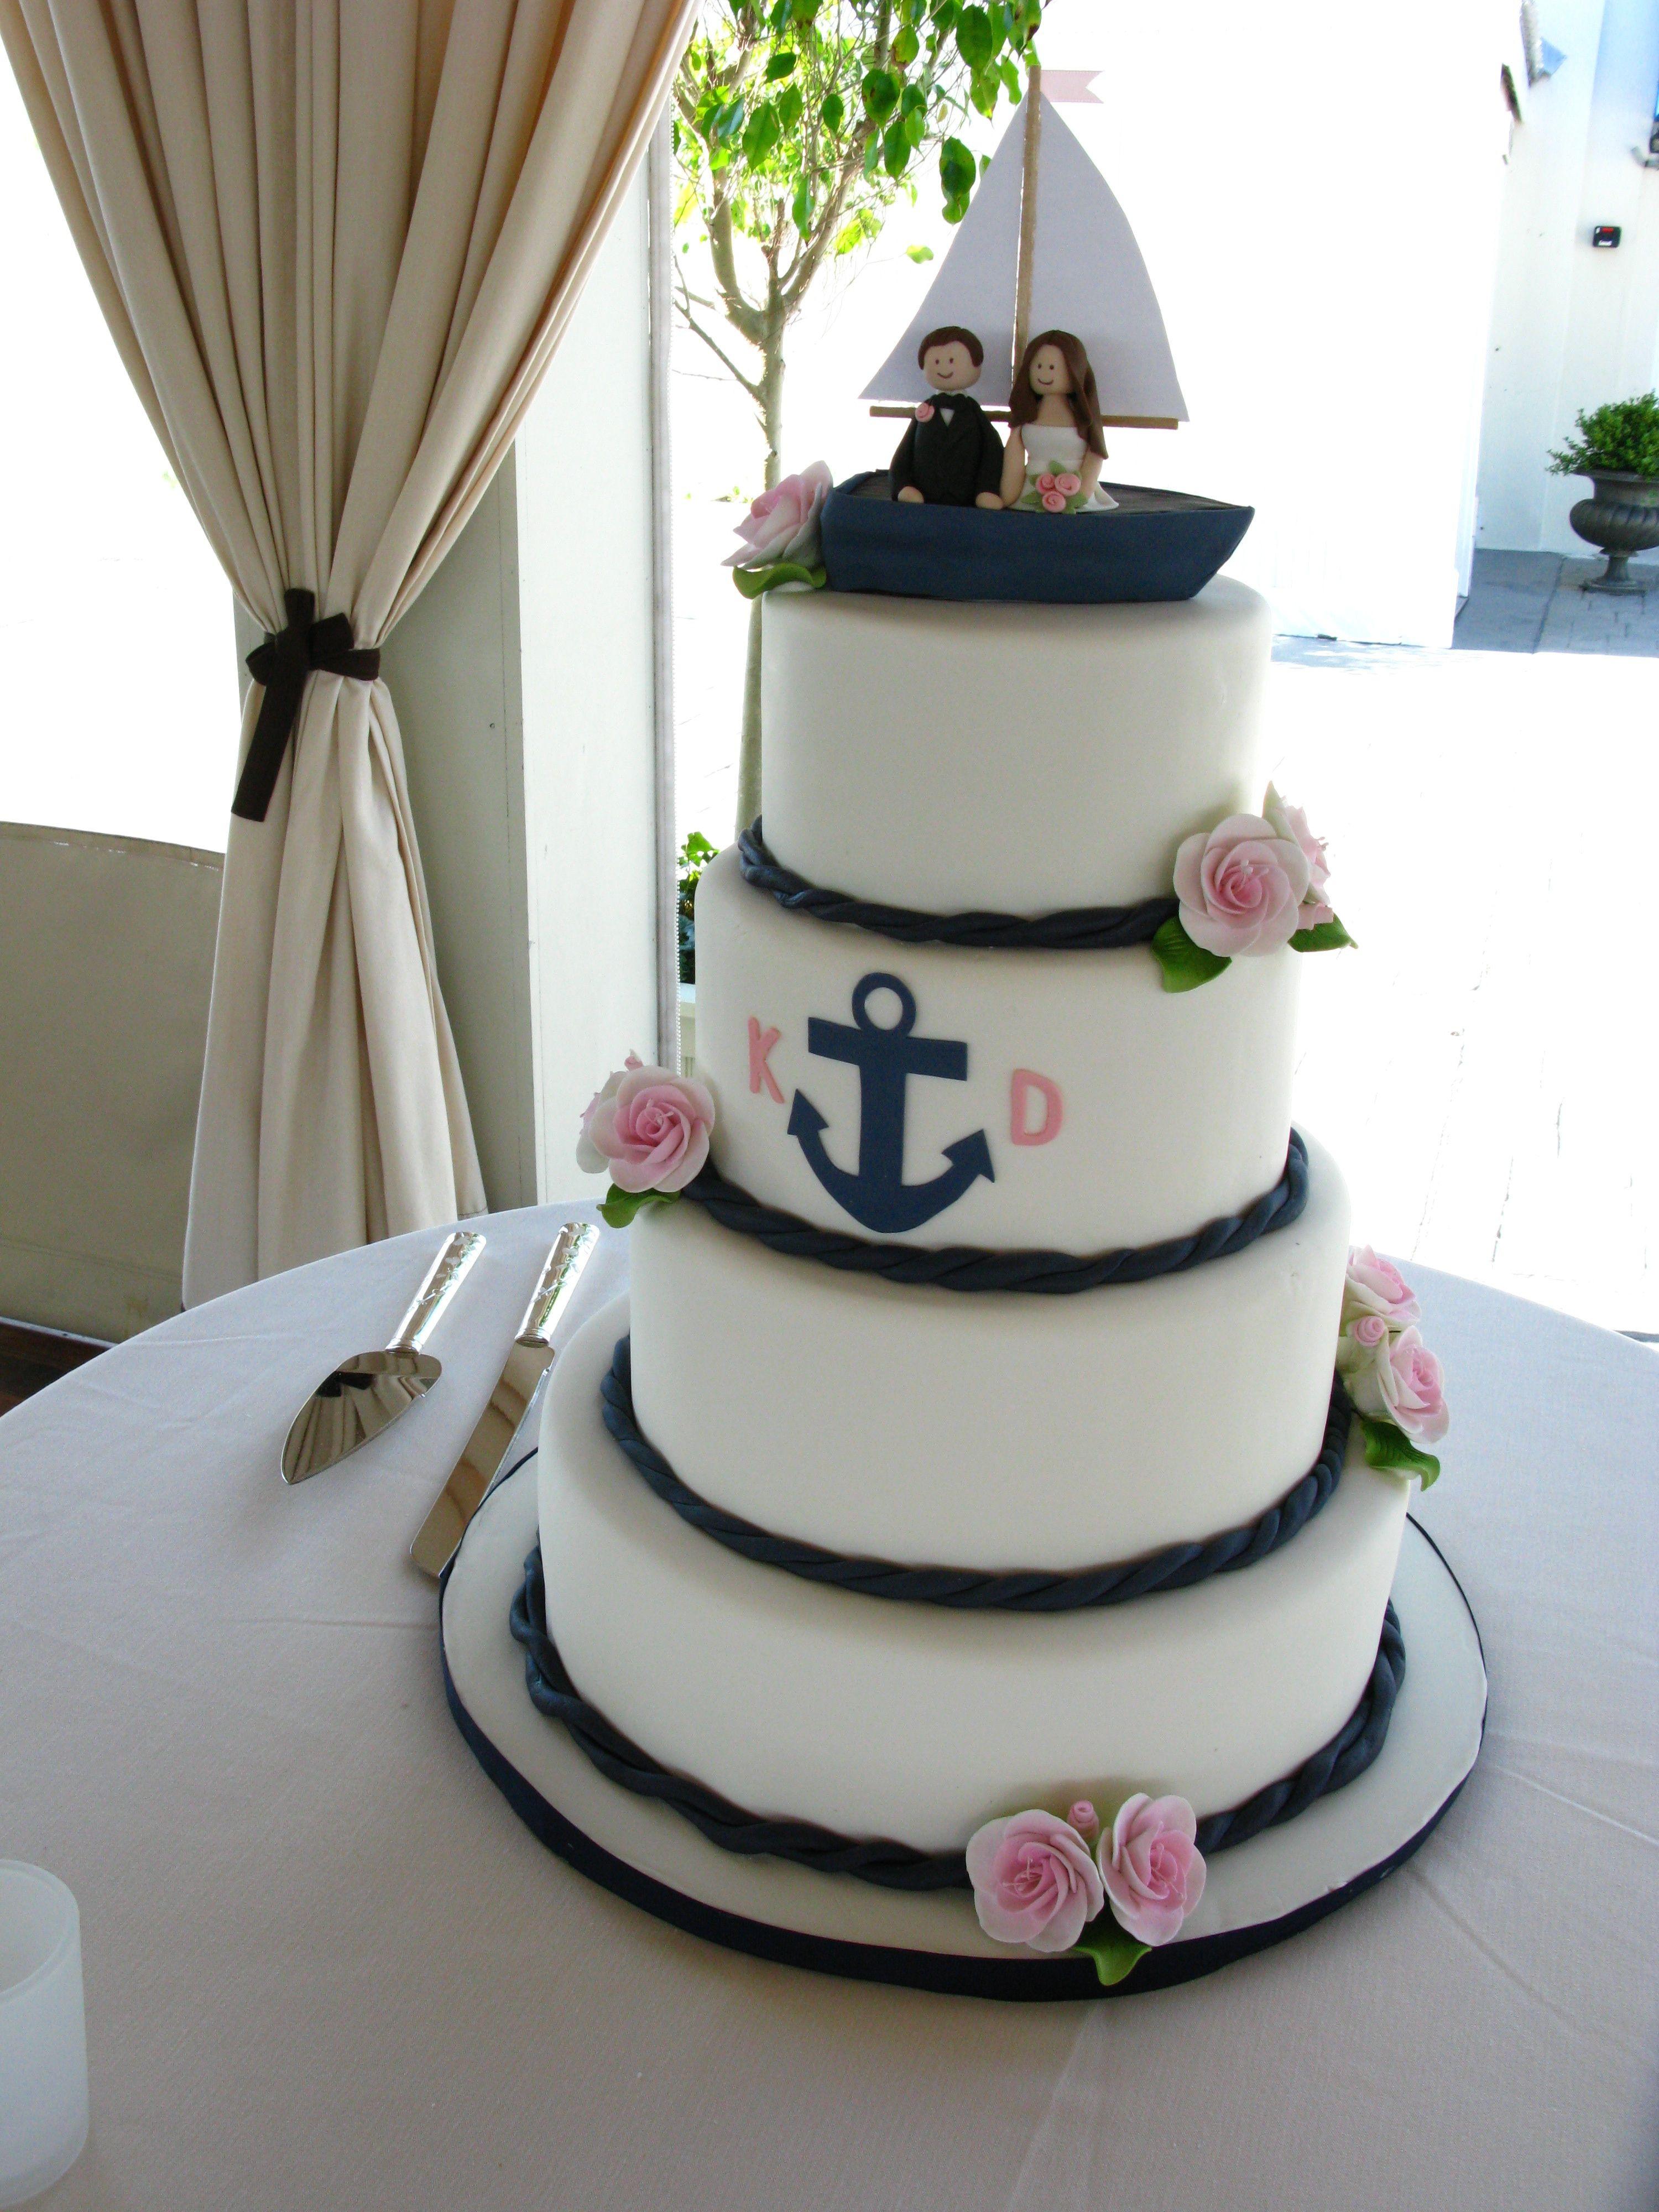 Anchor Wedding Cakes  Nautical wedding cake anchor wedding cake cute wedding